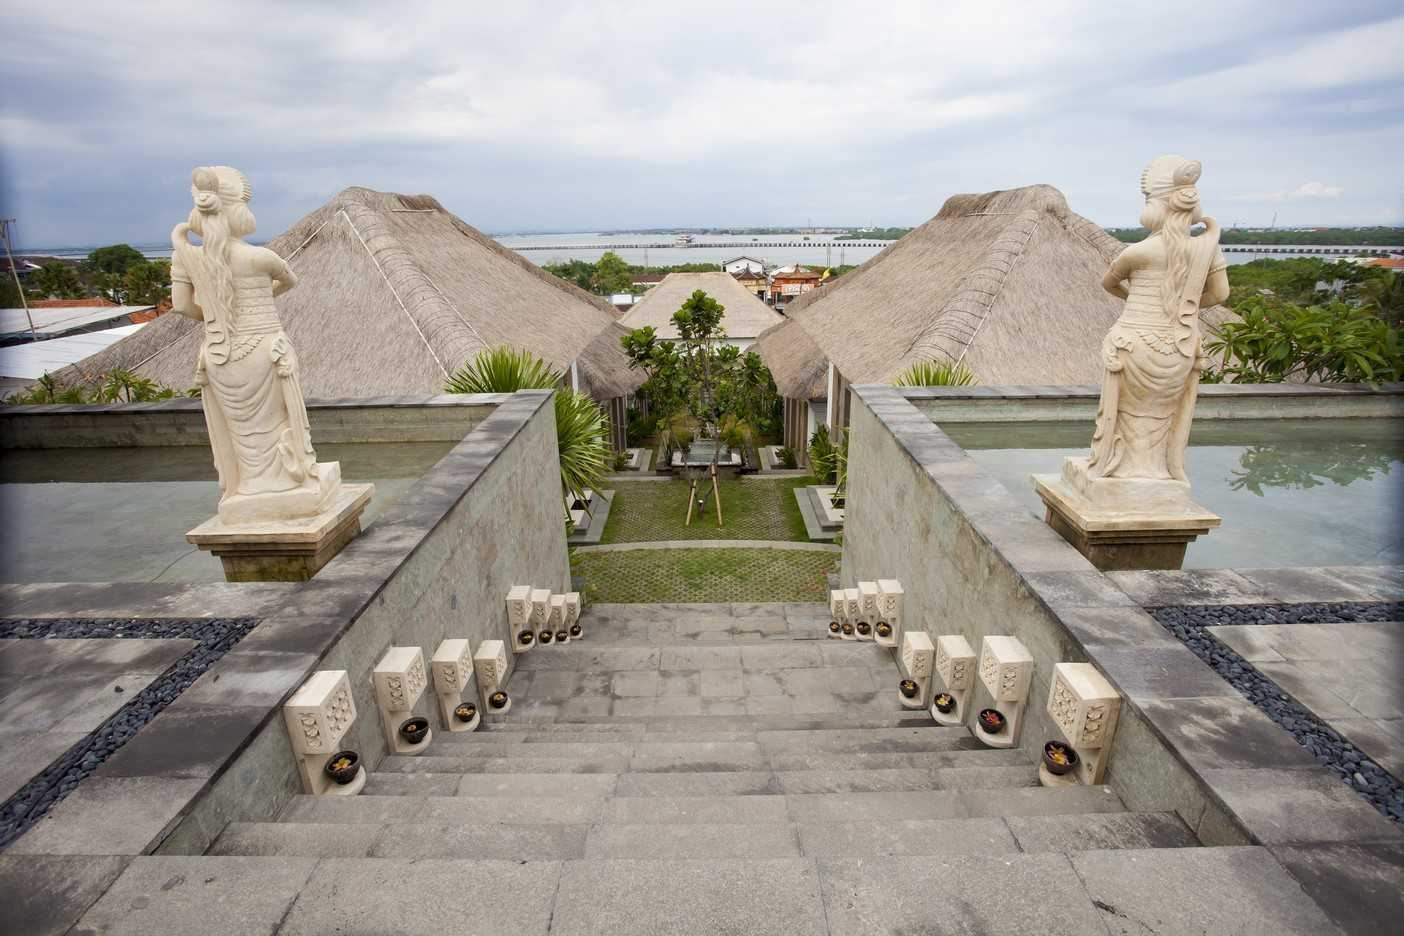 Emporio Architect Zen Family Spa Nusa Dua Benoa, Kec. Kuta Sel., Kabupaten Badung, Bali, Indonesia Benoa, Kec. Kuta Sel., Kabupaten Badung, Bali, Indonesia Emporio-Architect-Zen-Family-Spa-Nusa-Dua   72696